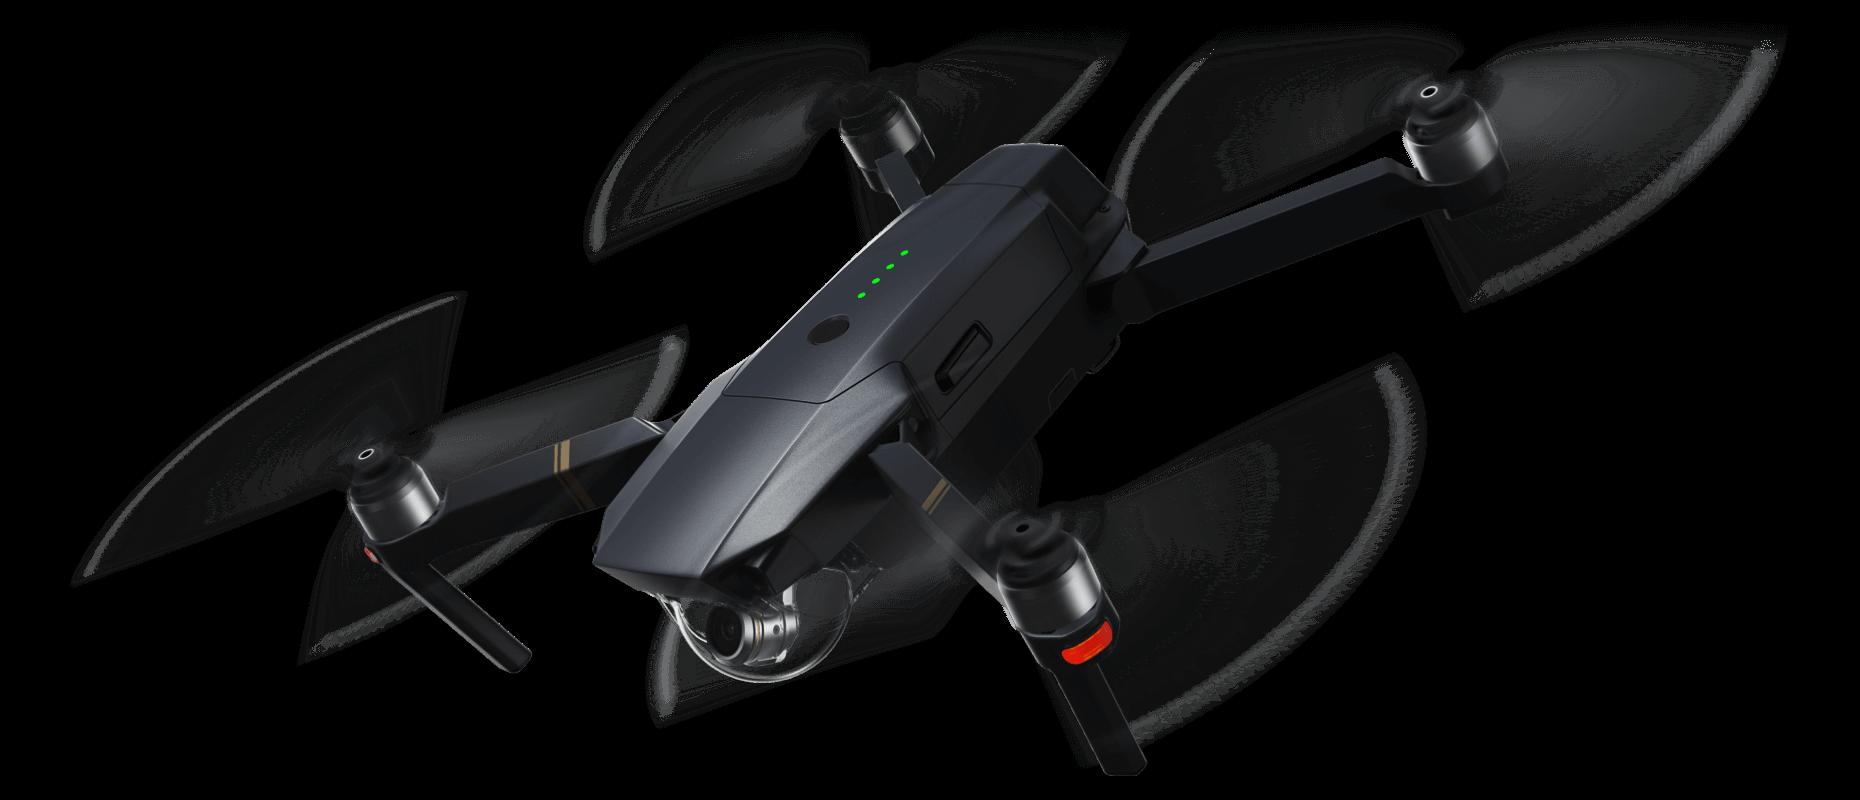 DJI Mavic Pro - Faltbare 4K Drohne